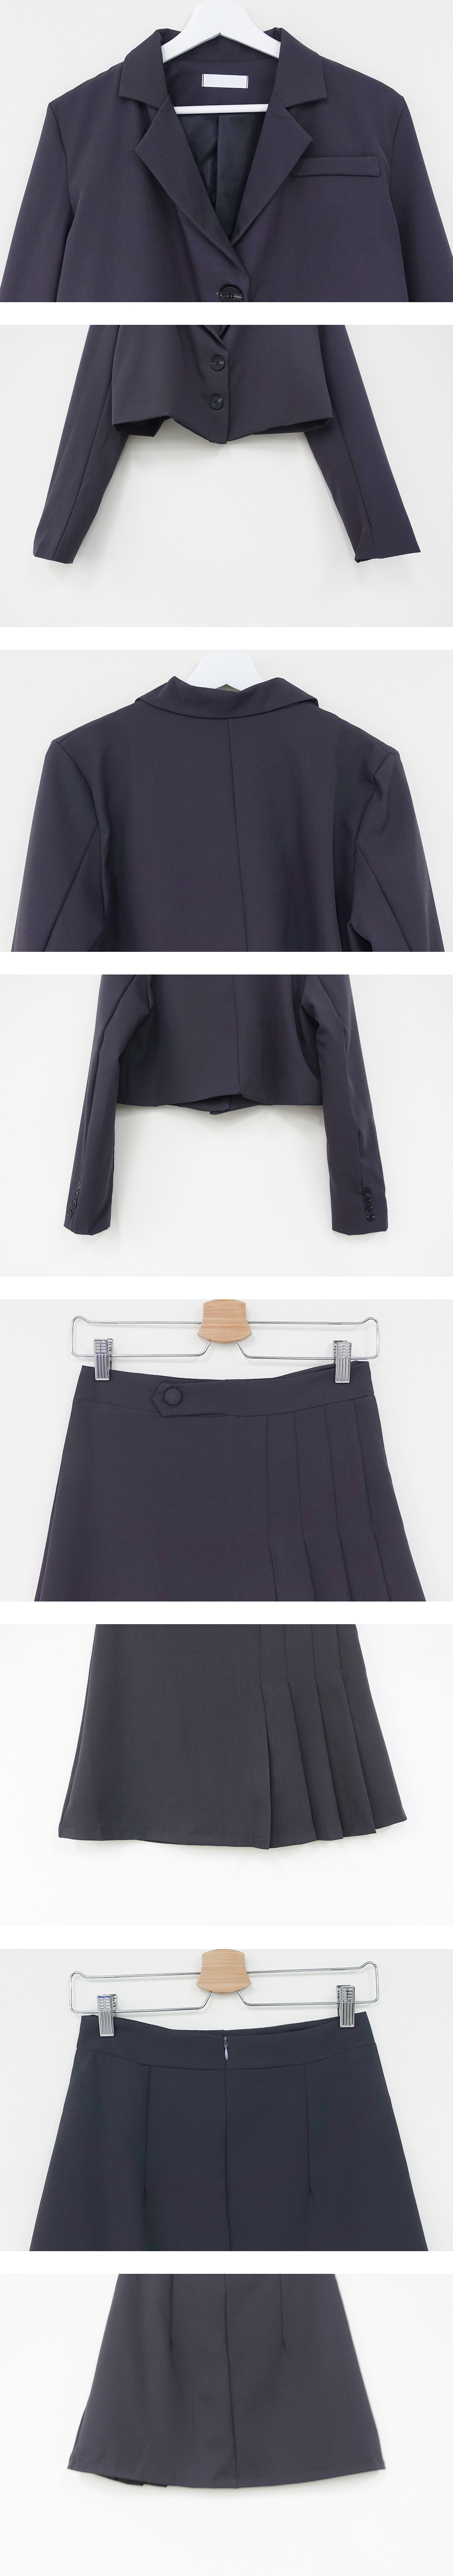 Cropped Jacket + Wrinkle Mini Skirt